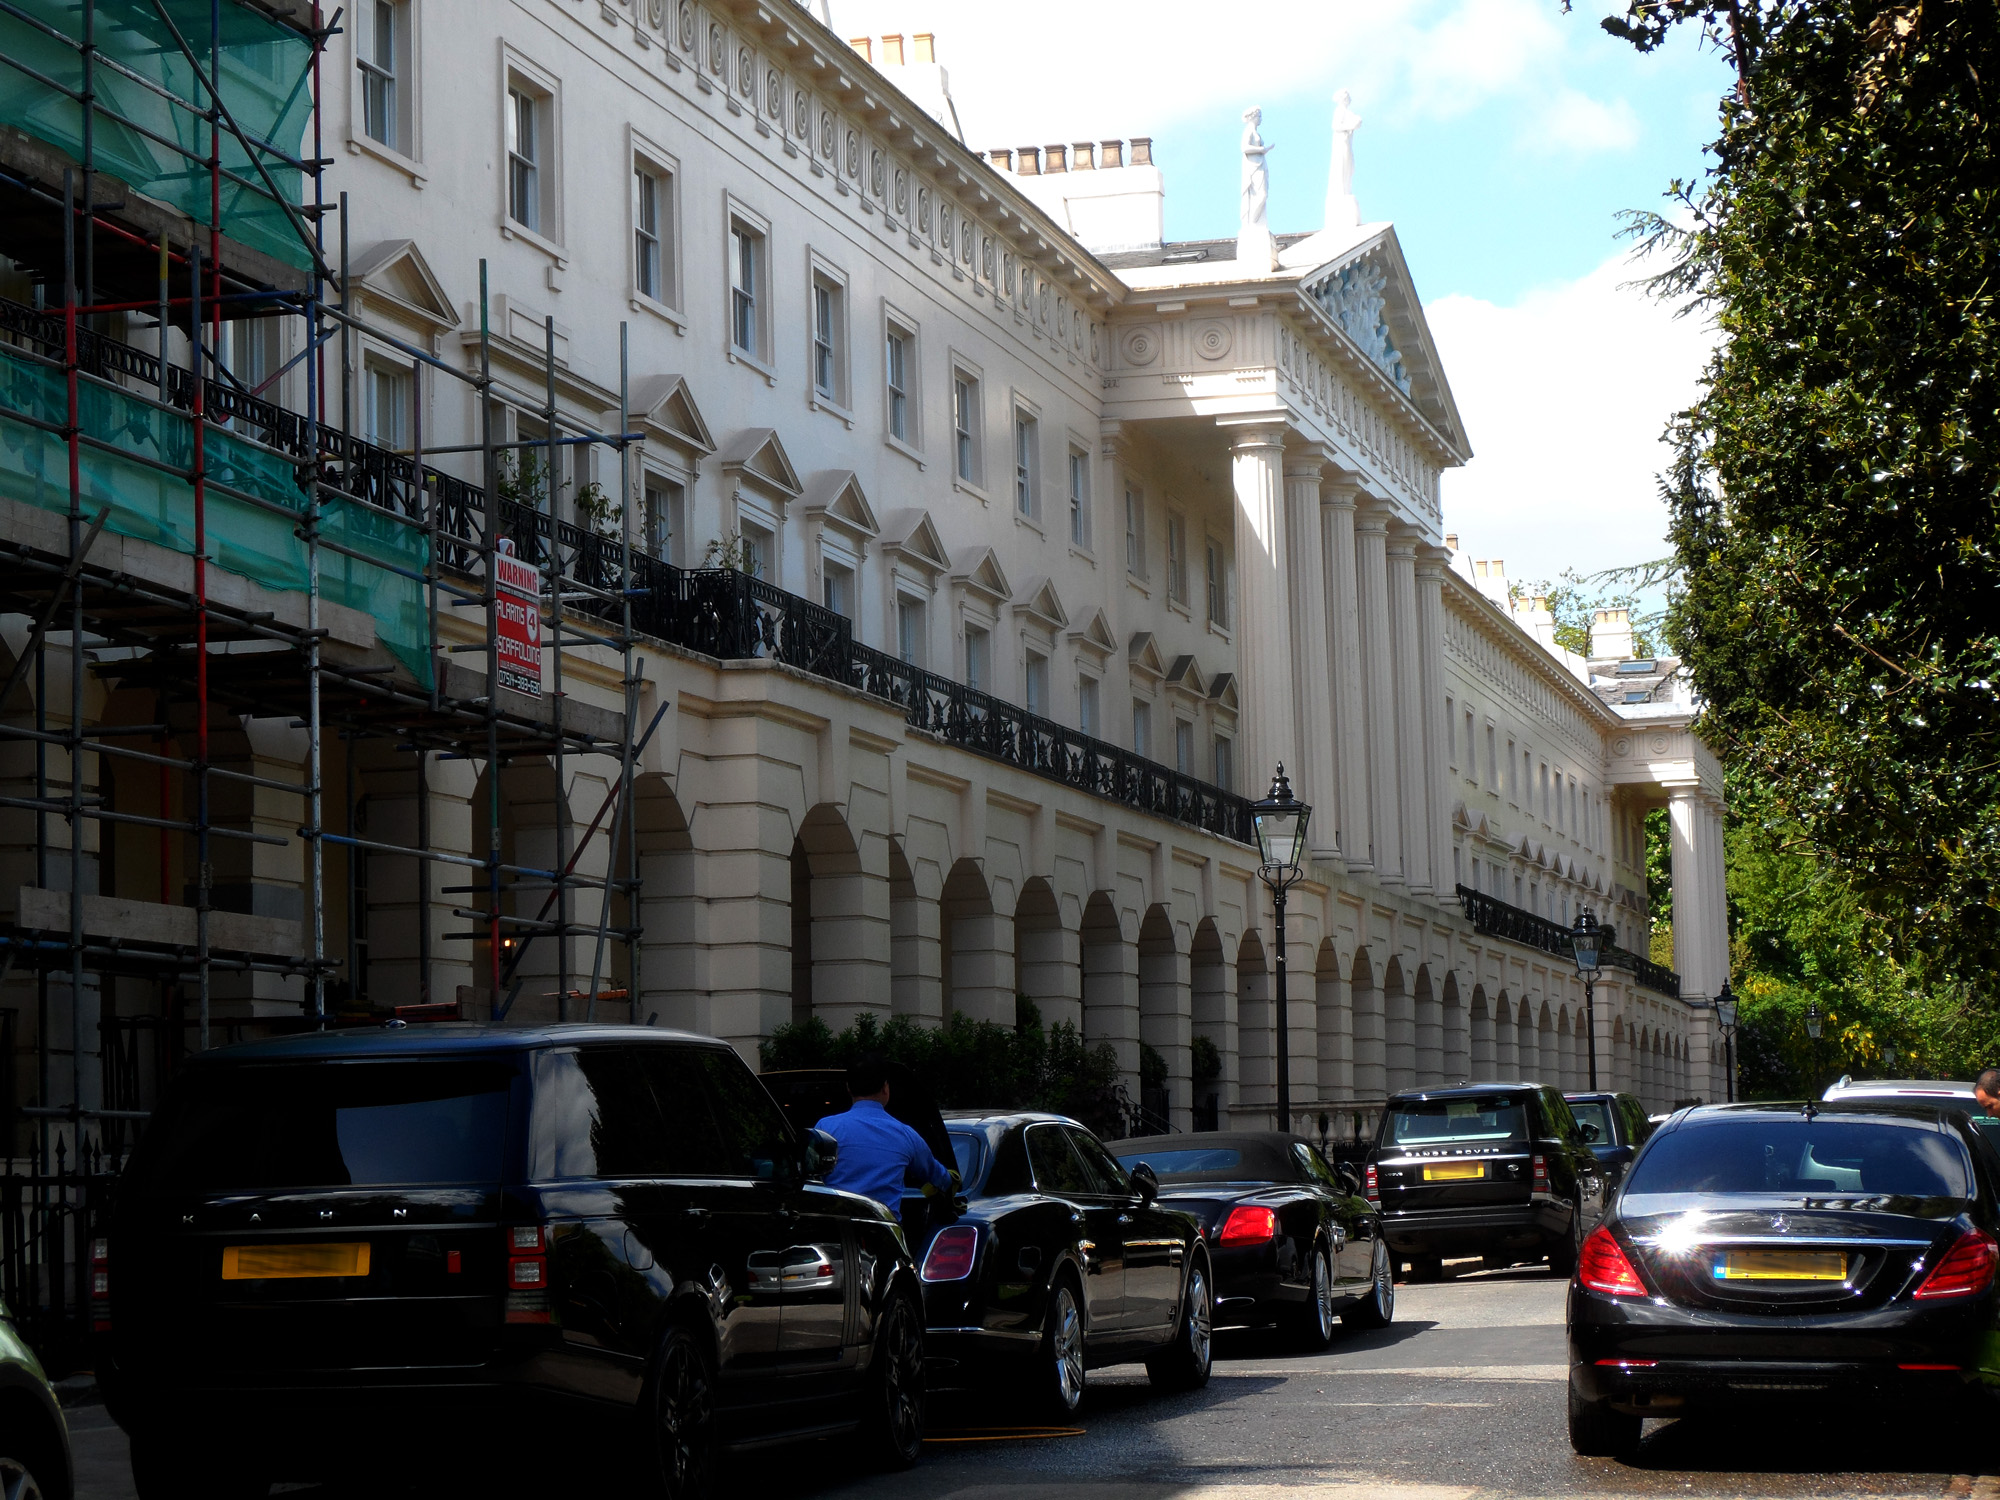 ANTHONY_SALVIN_-_11_Hanover_Terrace_Regent's_Park_London_NW1_4RJ_est (1)